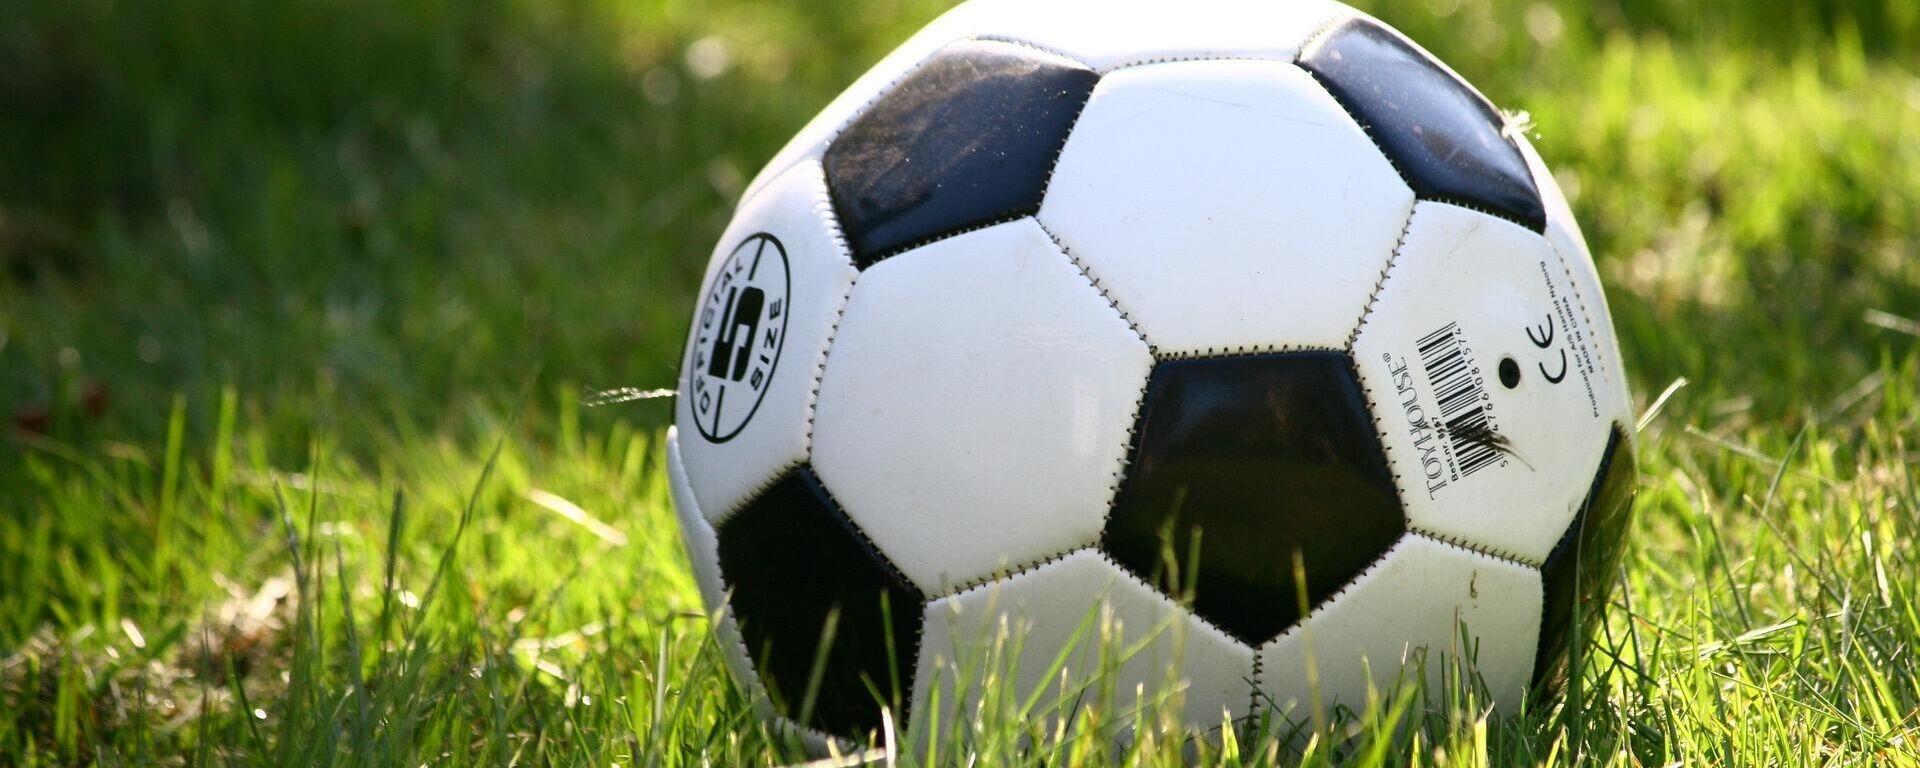 balón de fútbol (imagen referencial) - Sputnik Mundo, 1920, 24.05.2021